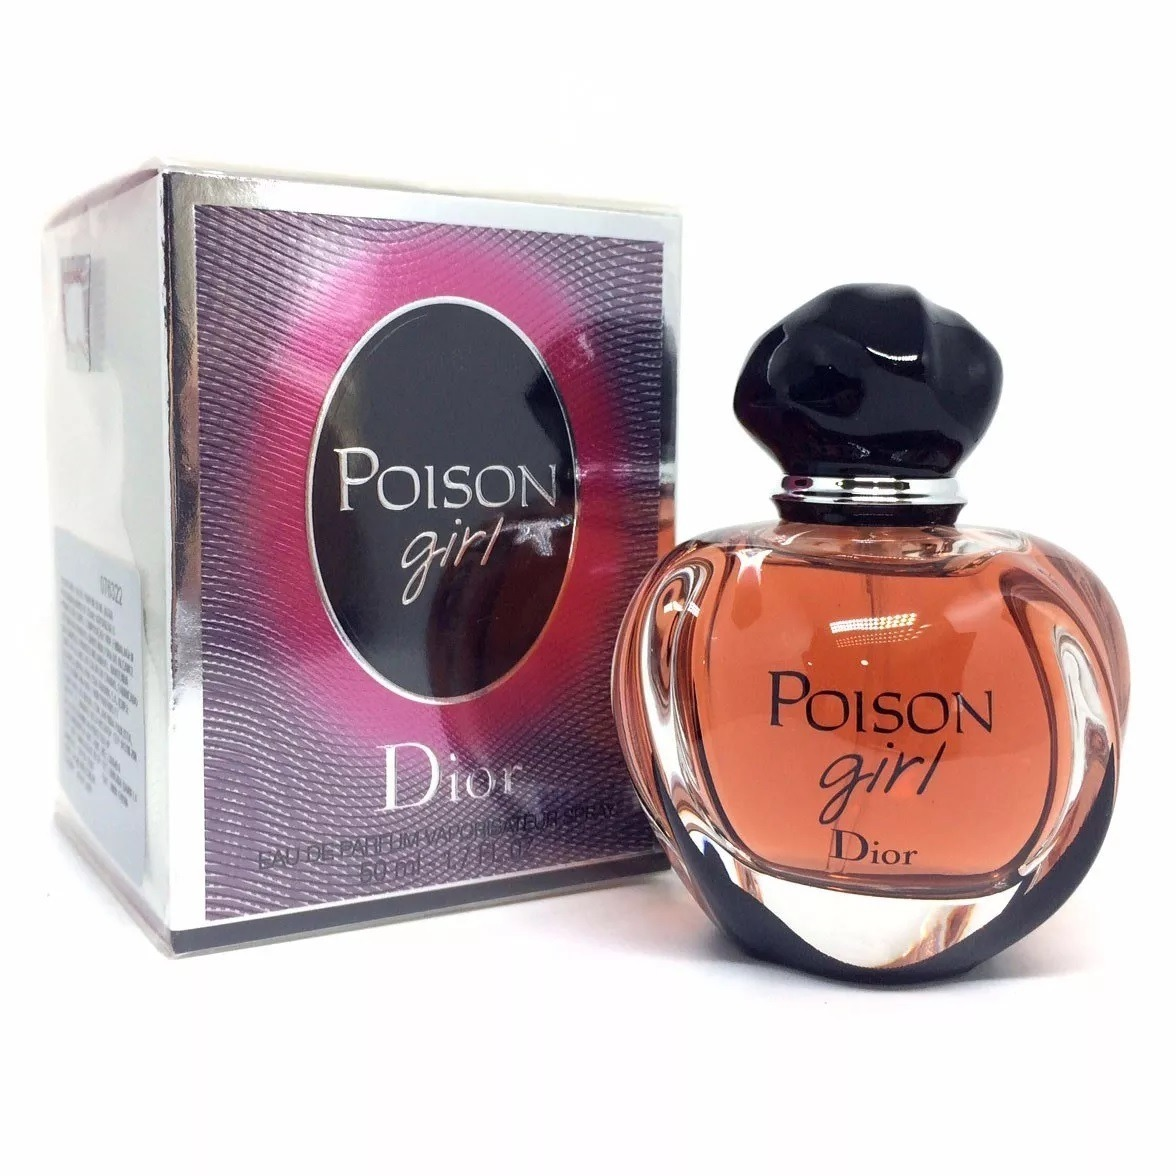 0ac6c2d1587 Dior Poison Girl Eau De Parfum 30ml Feminino 100% Original - R  229 ...